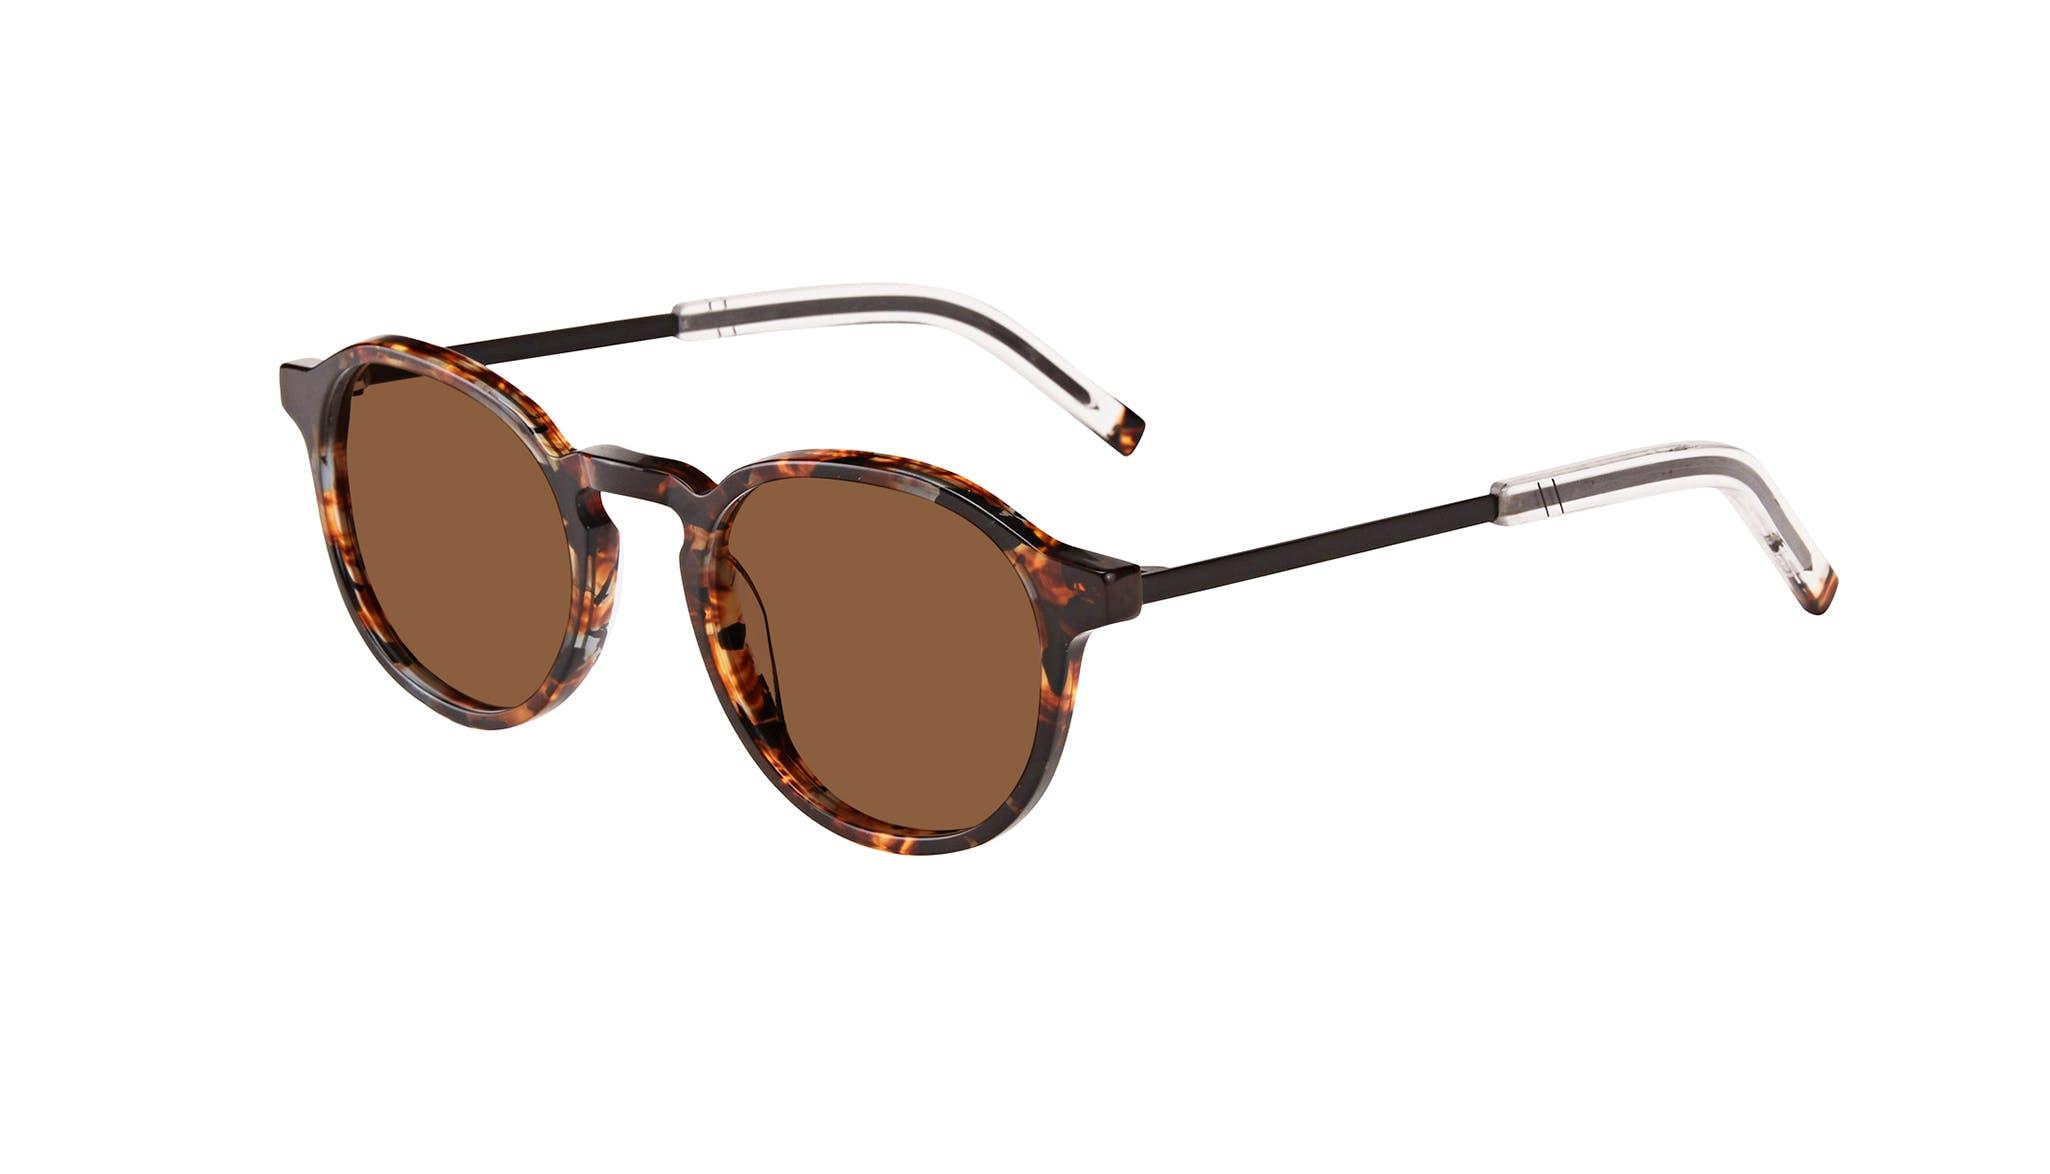 Affordable Fashion Glasses Round Sunglasses Men Prime XL Mahogany Tilt